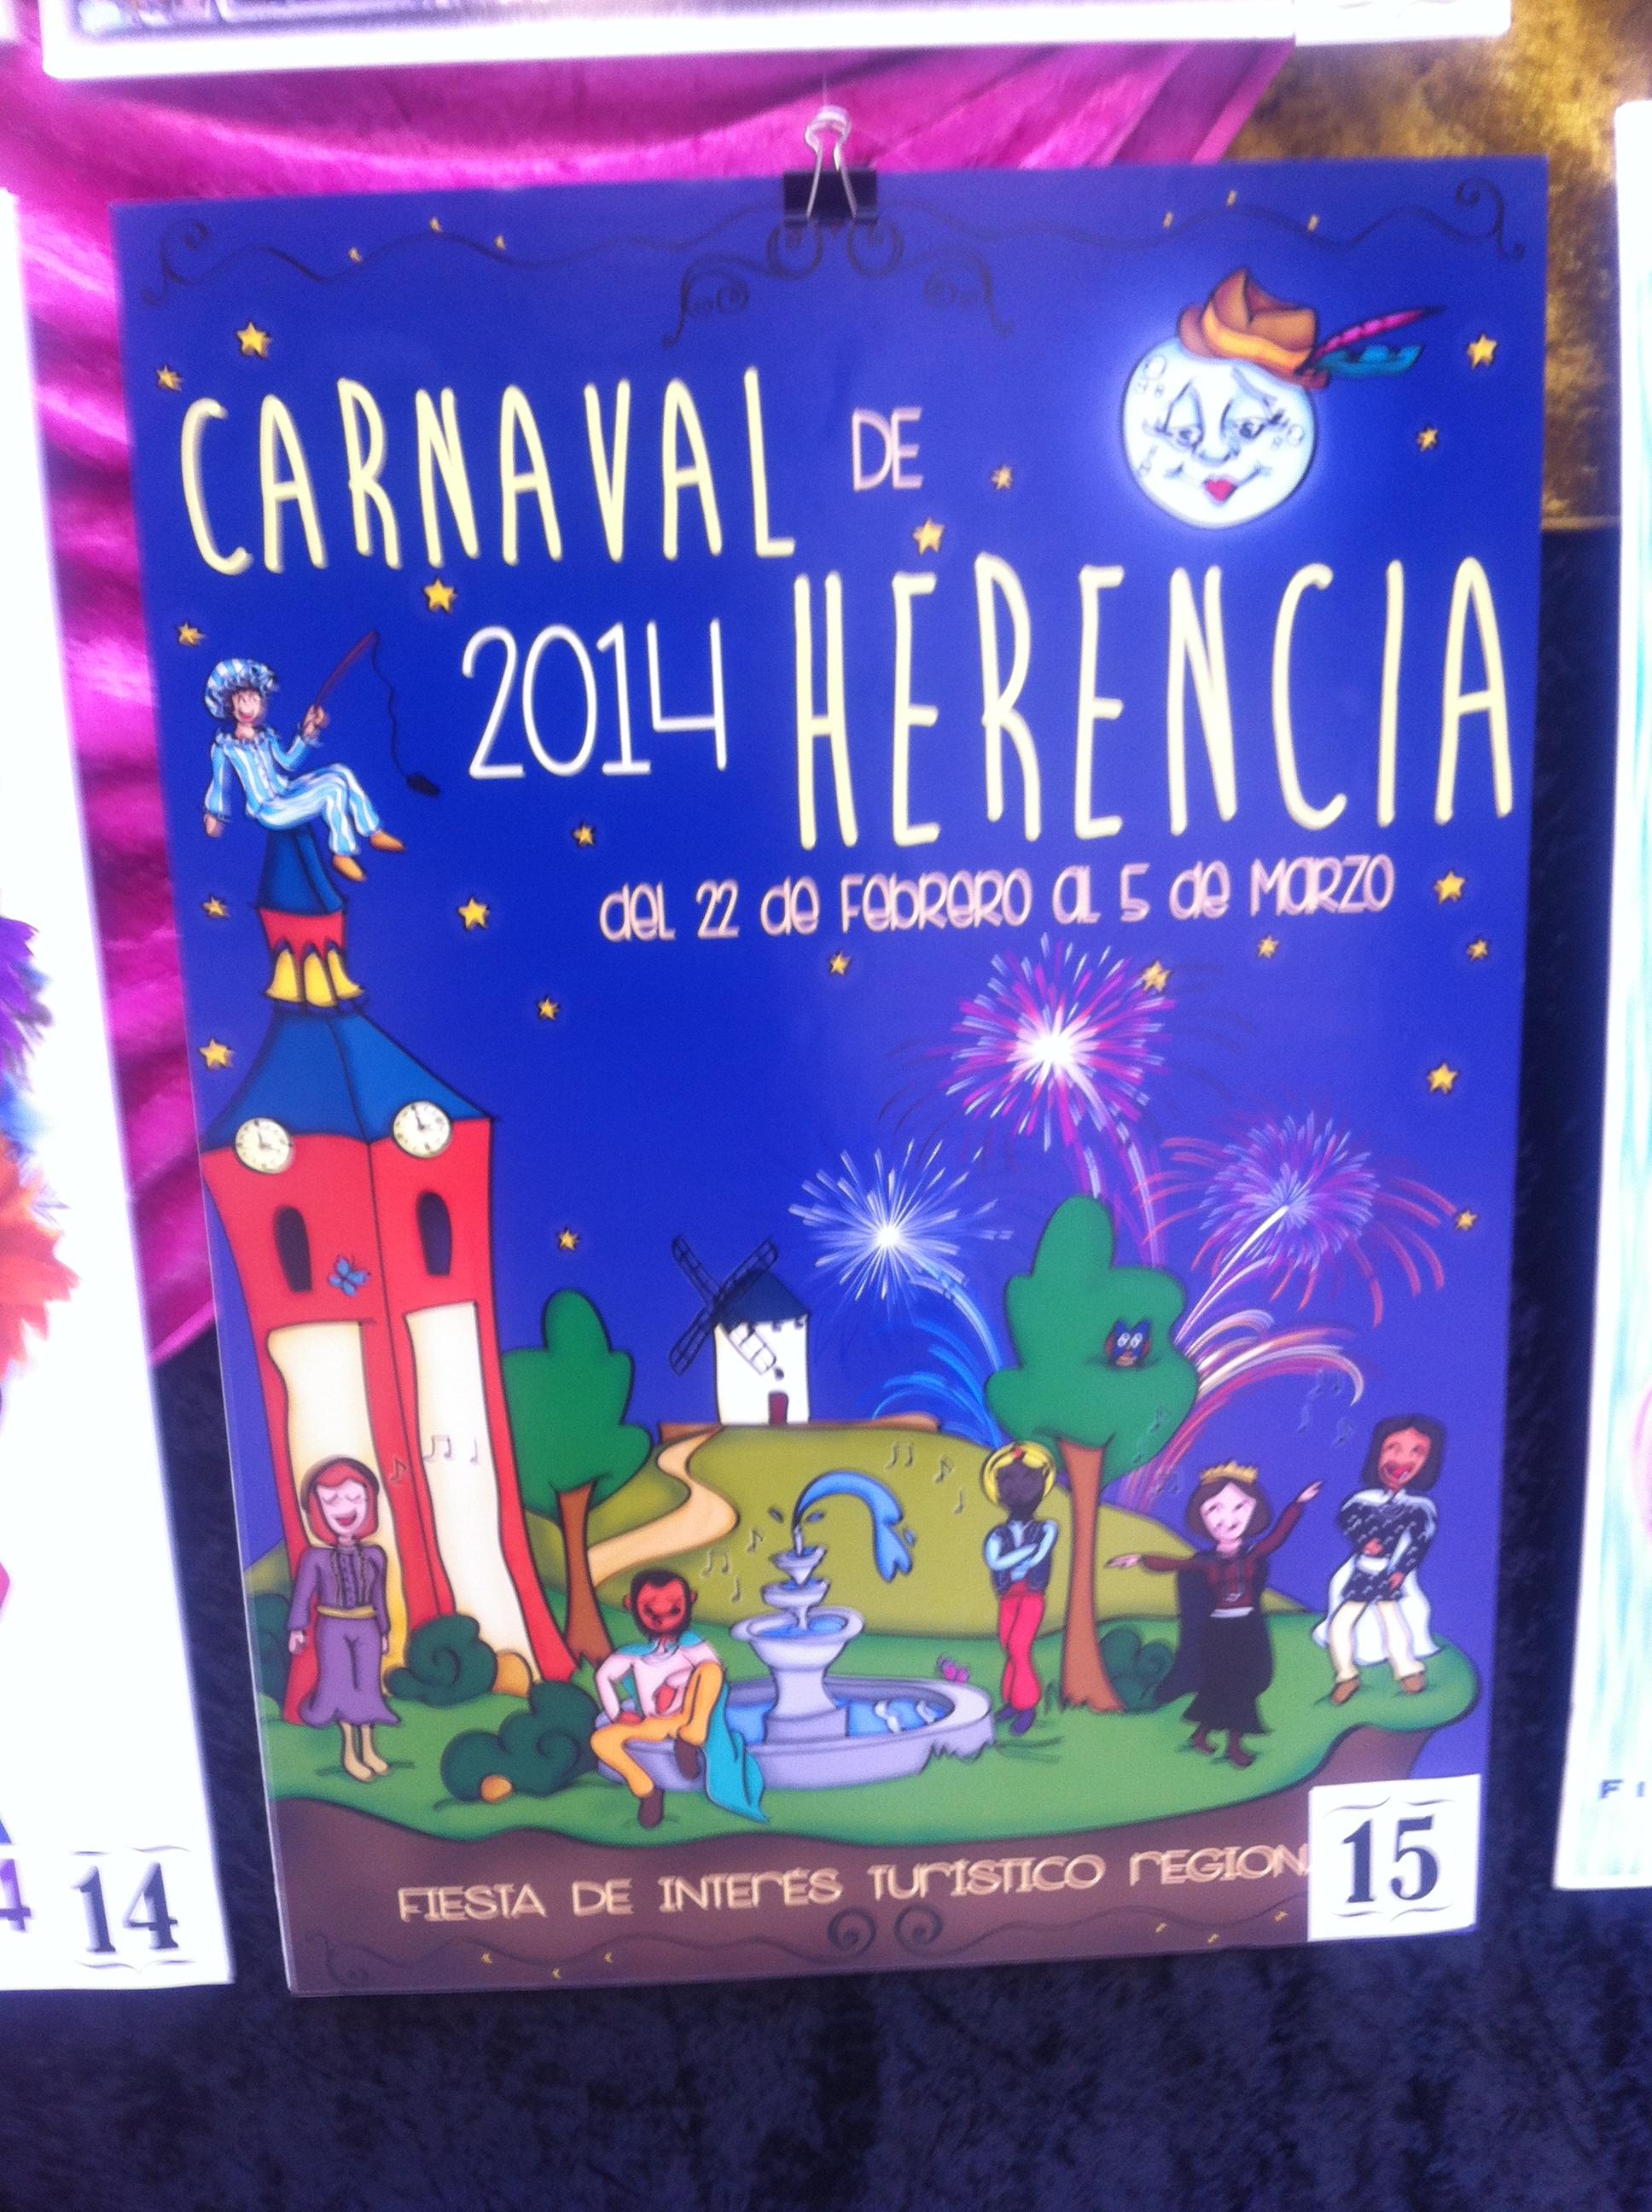 Concurso Carteles Carnaval 2014 (15)